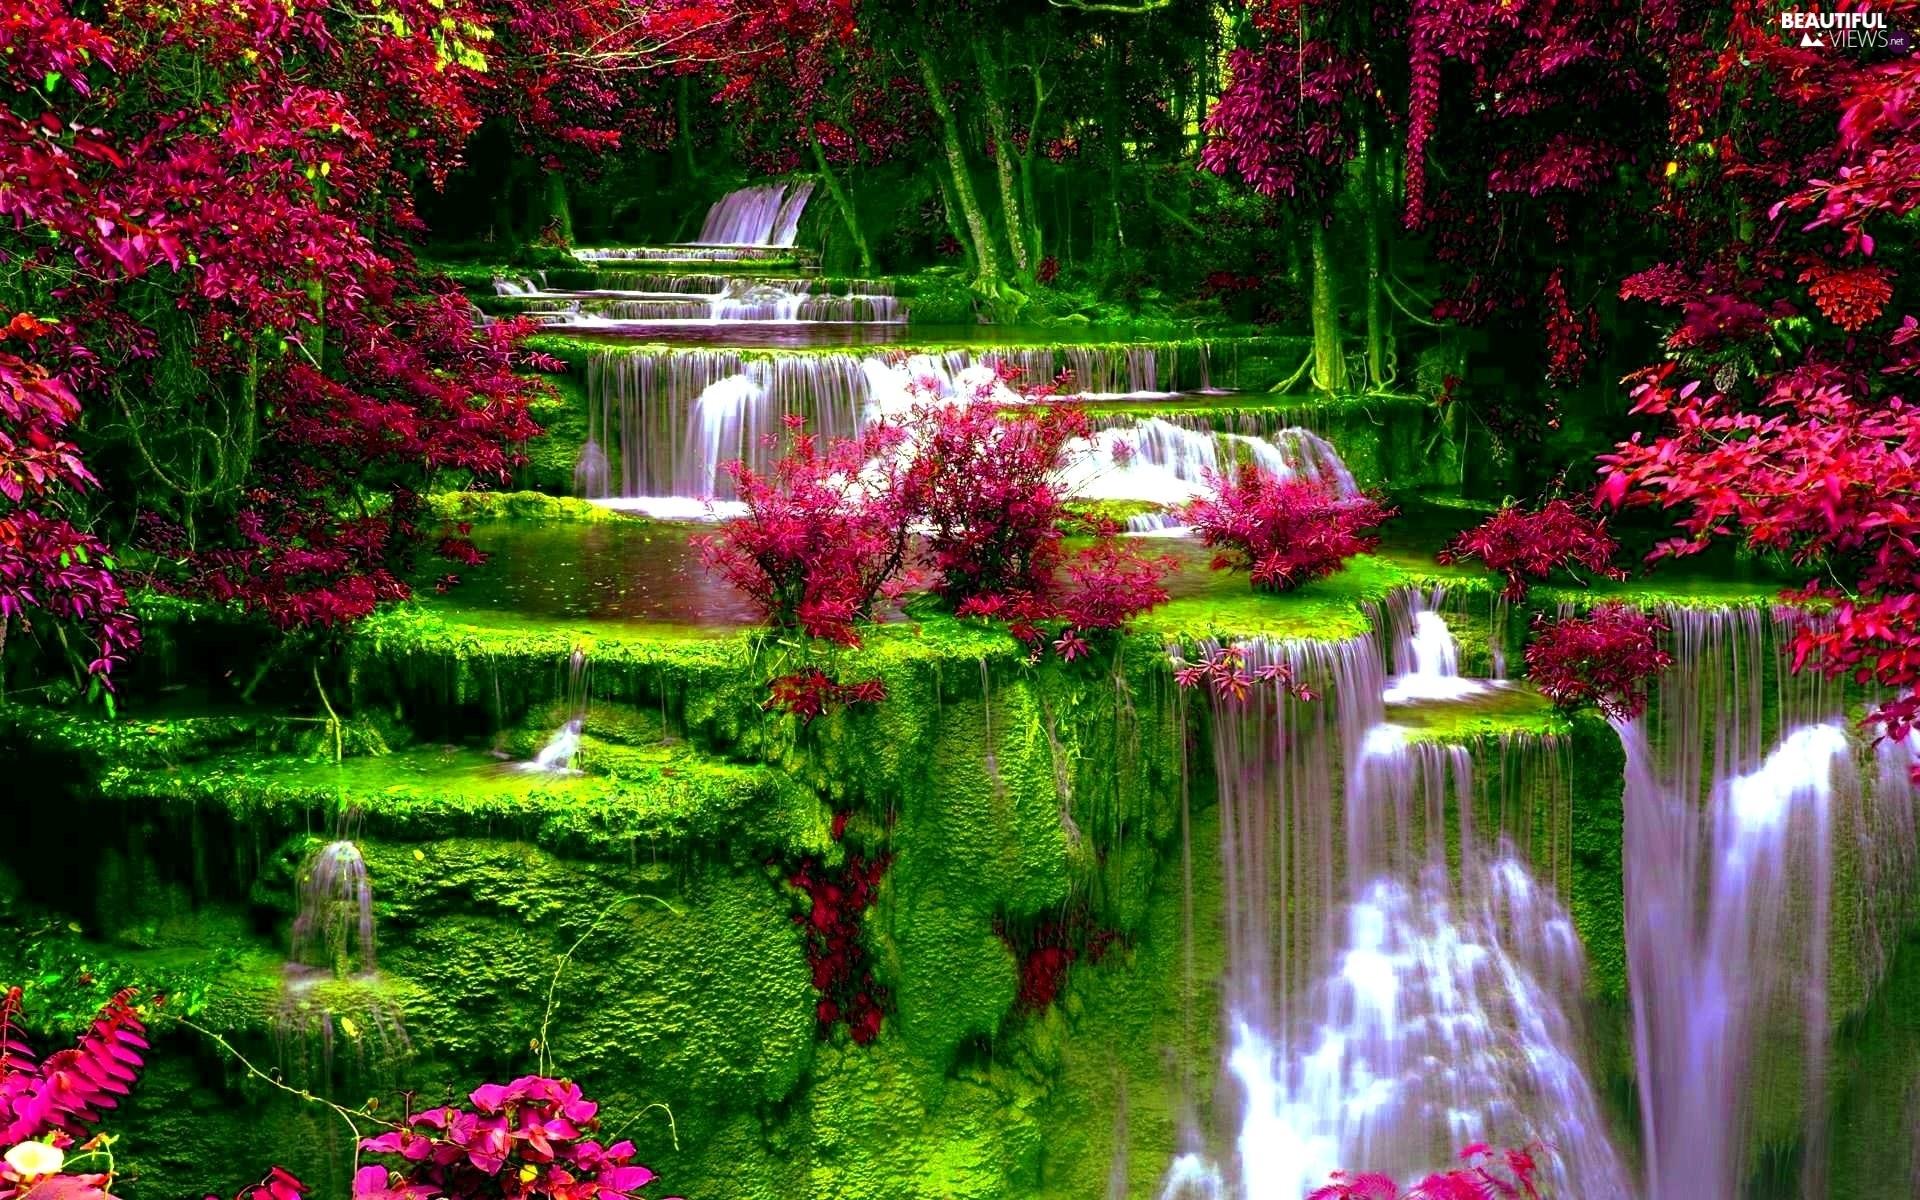 VEGETATION, Waterfall, Flowers